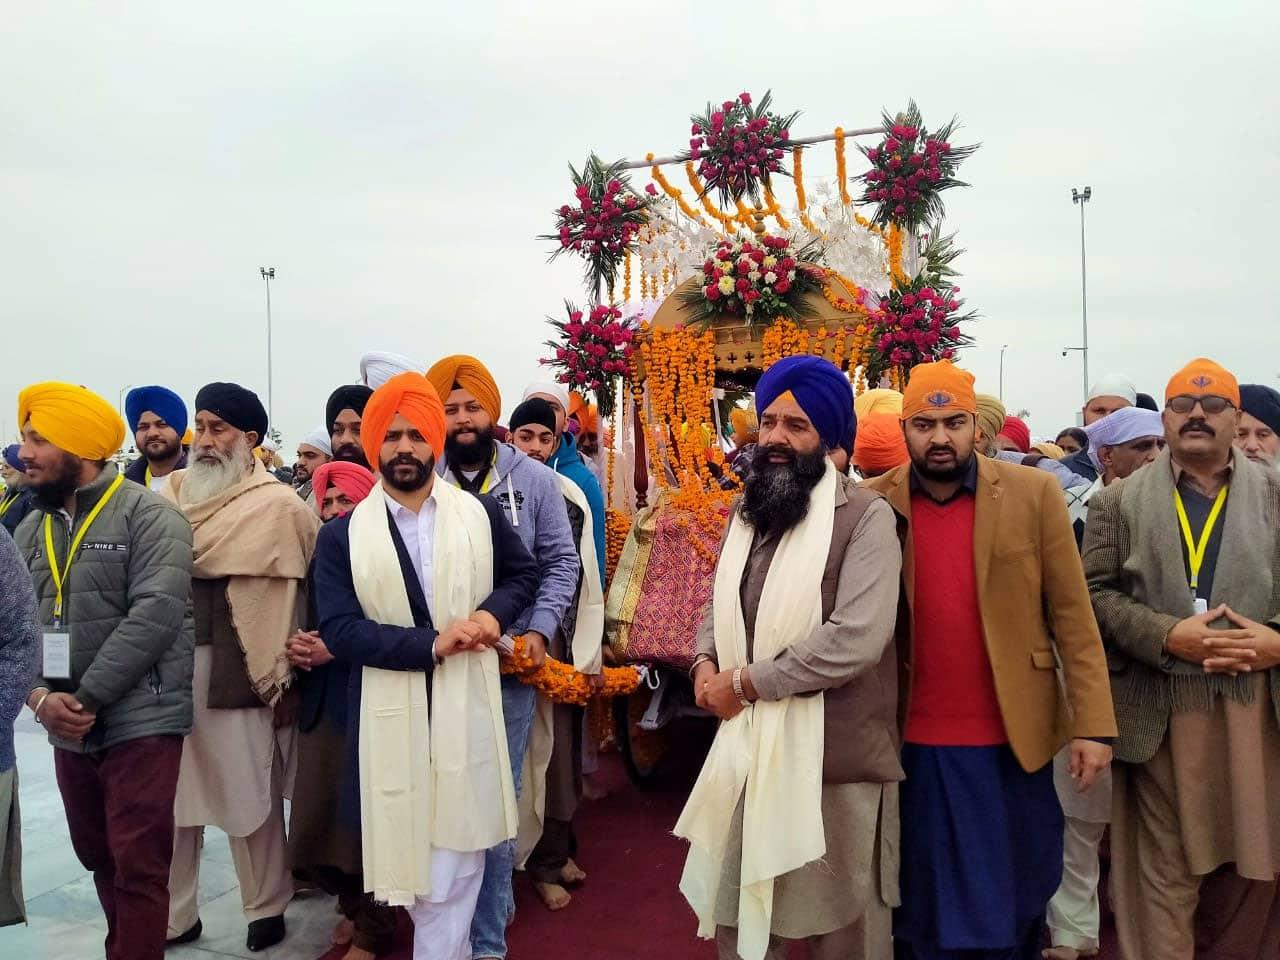 Guru Gobind Singh Ji's birthday celebrations